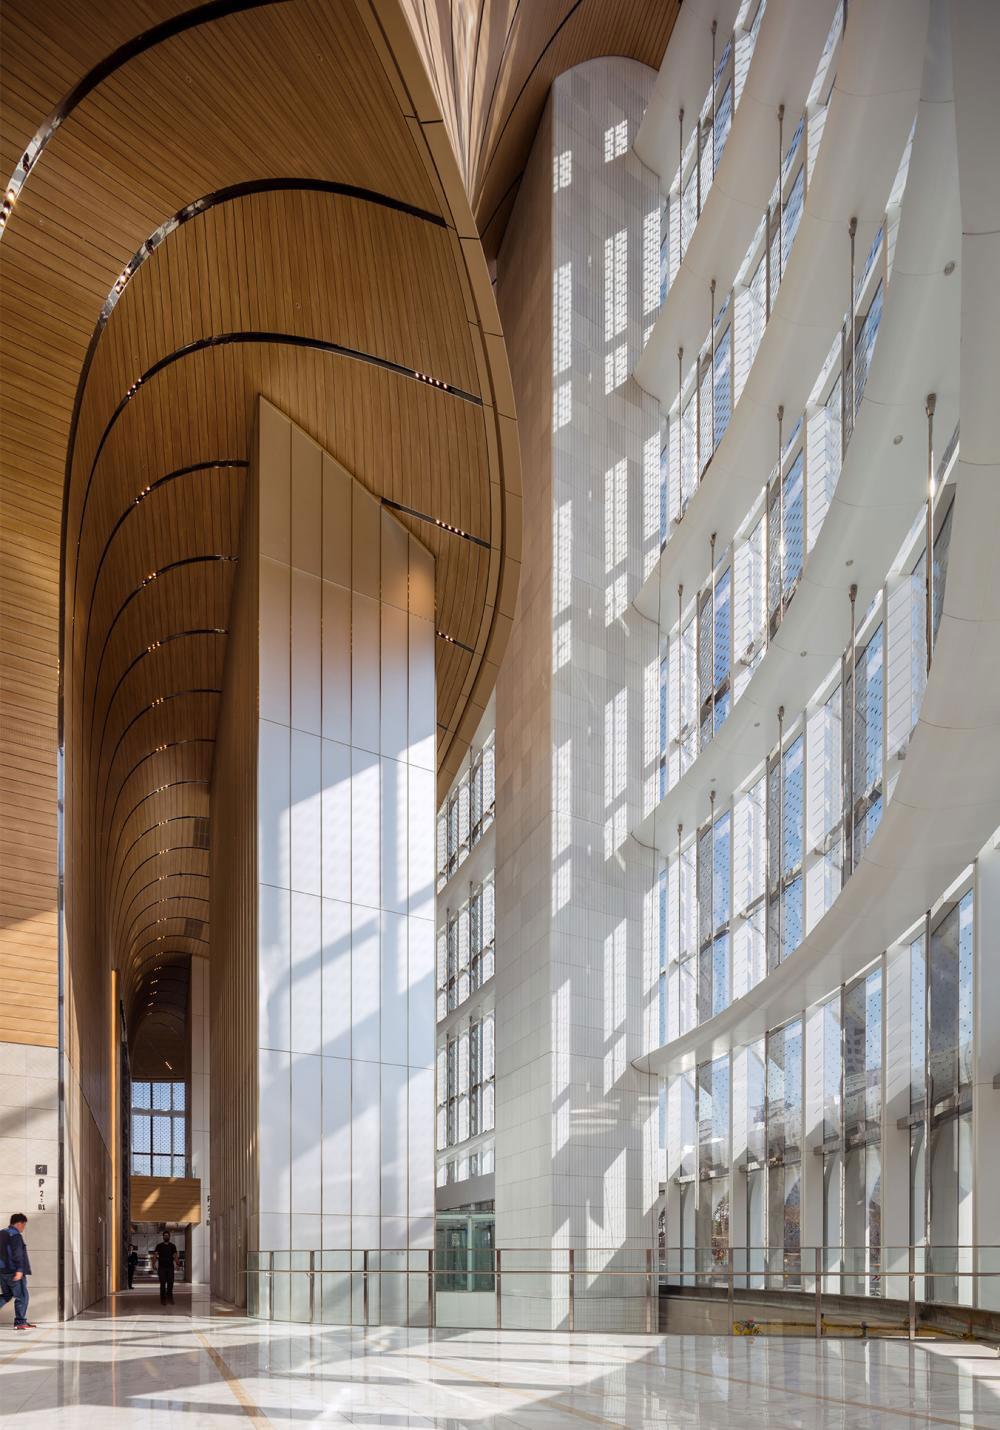 Lotte World Tower Kpf Snupdesign